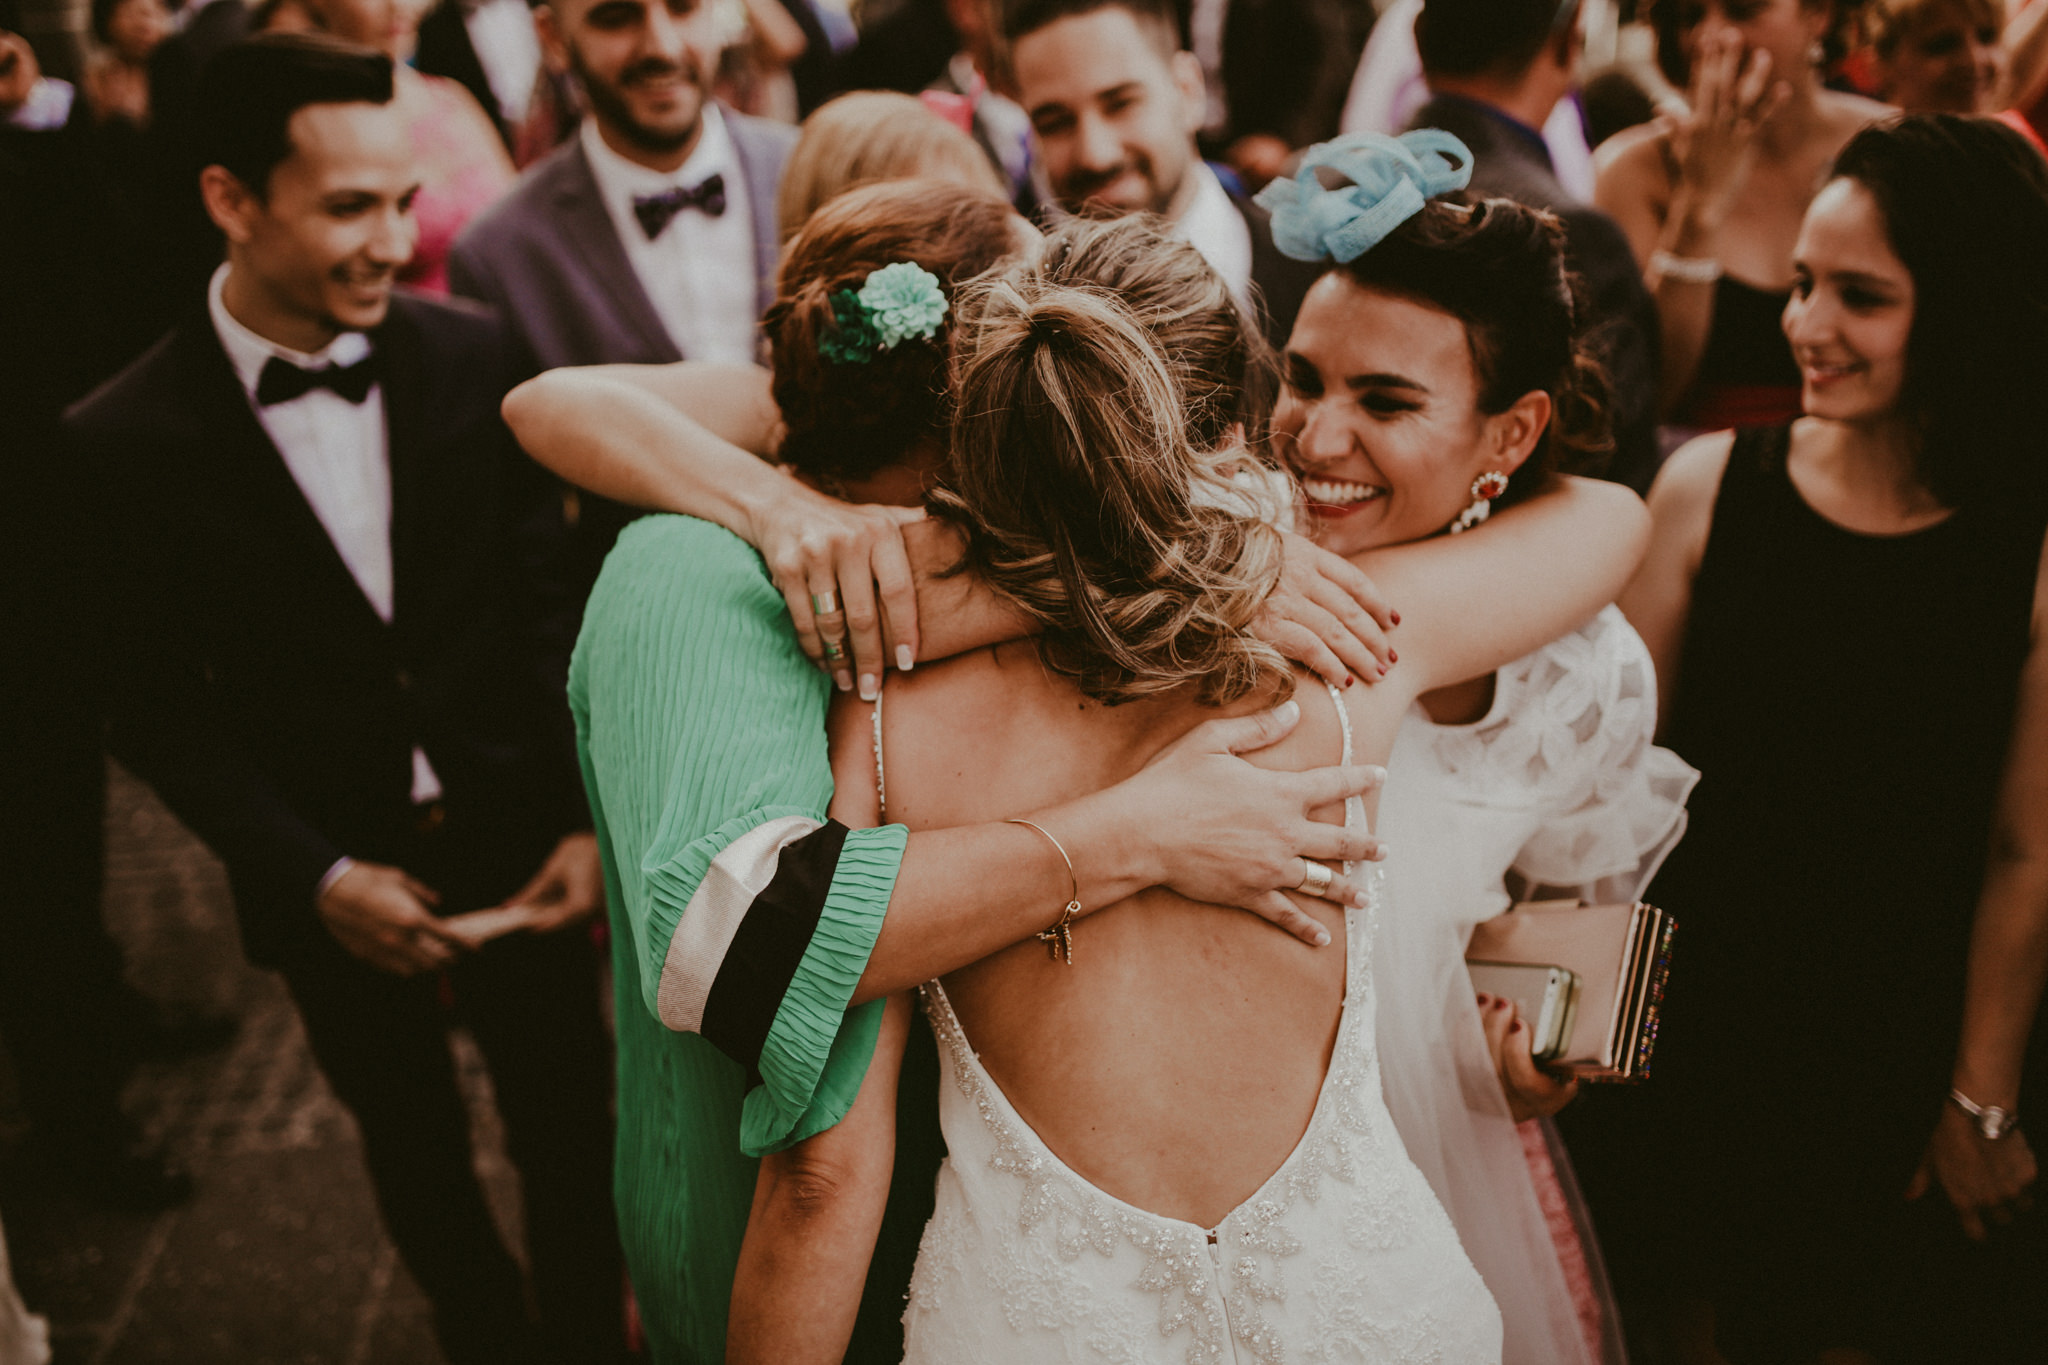 boda-diferente-fotografo-boda-laspalmas-grancanaria-52